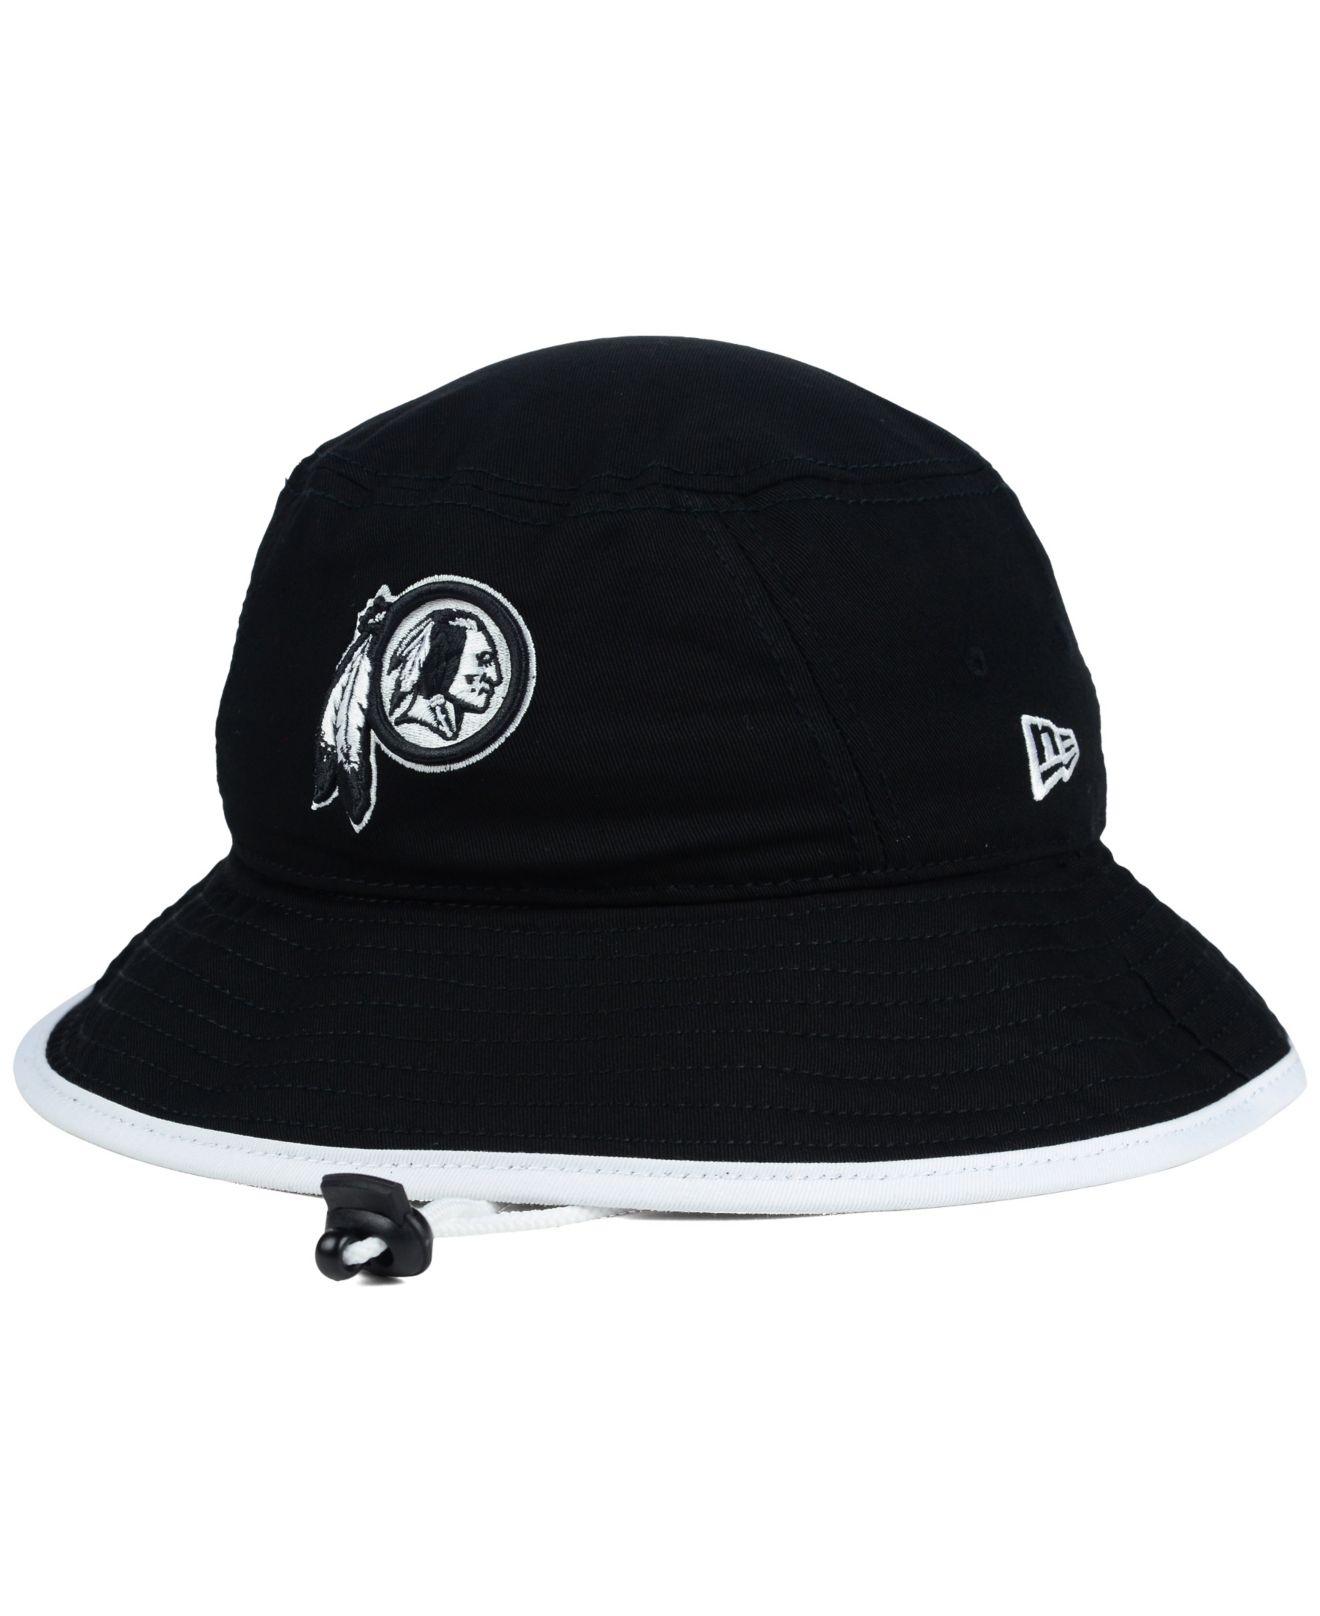 Lyst - KTZ Washington Redskins Nfl Black White Bucket Hat in Black ... 3e6112a58